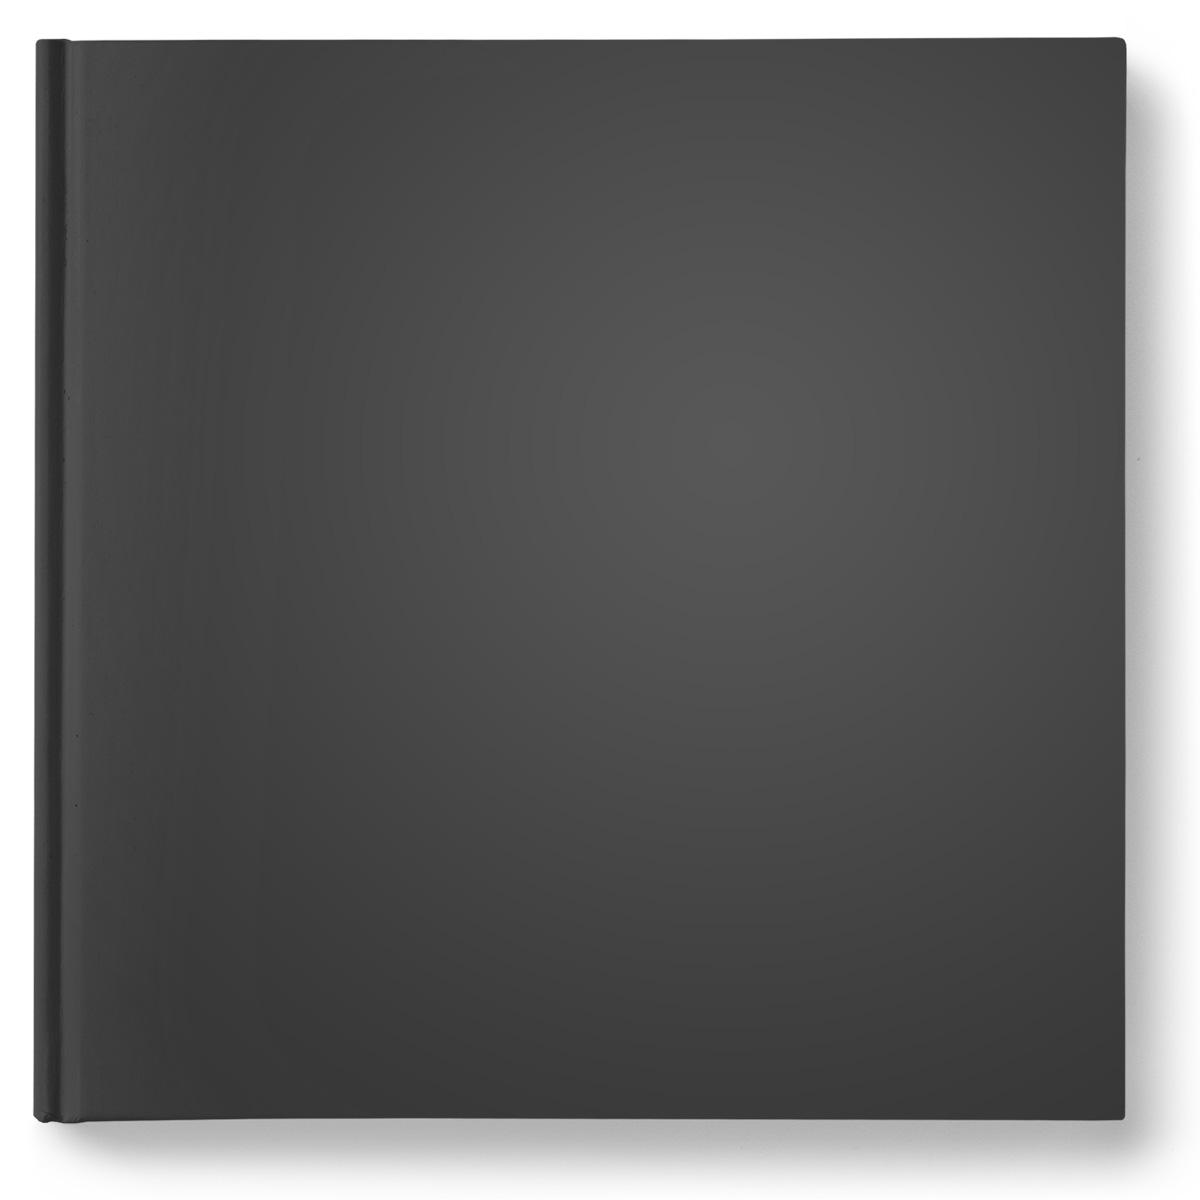 Square Book Flat Mockup